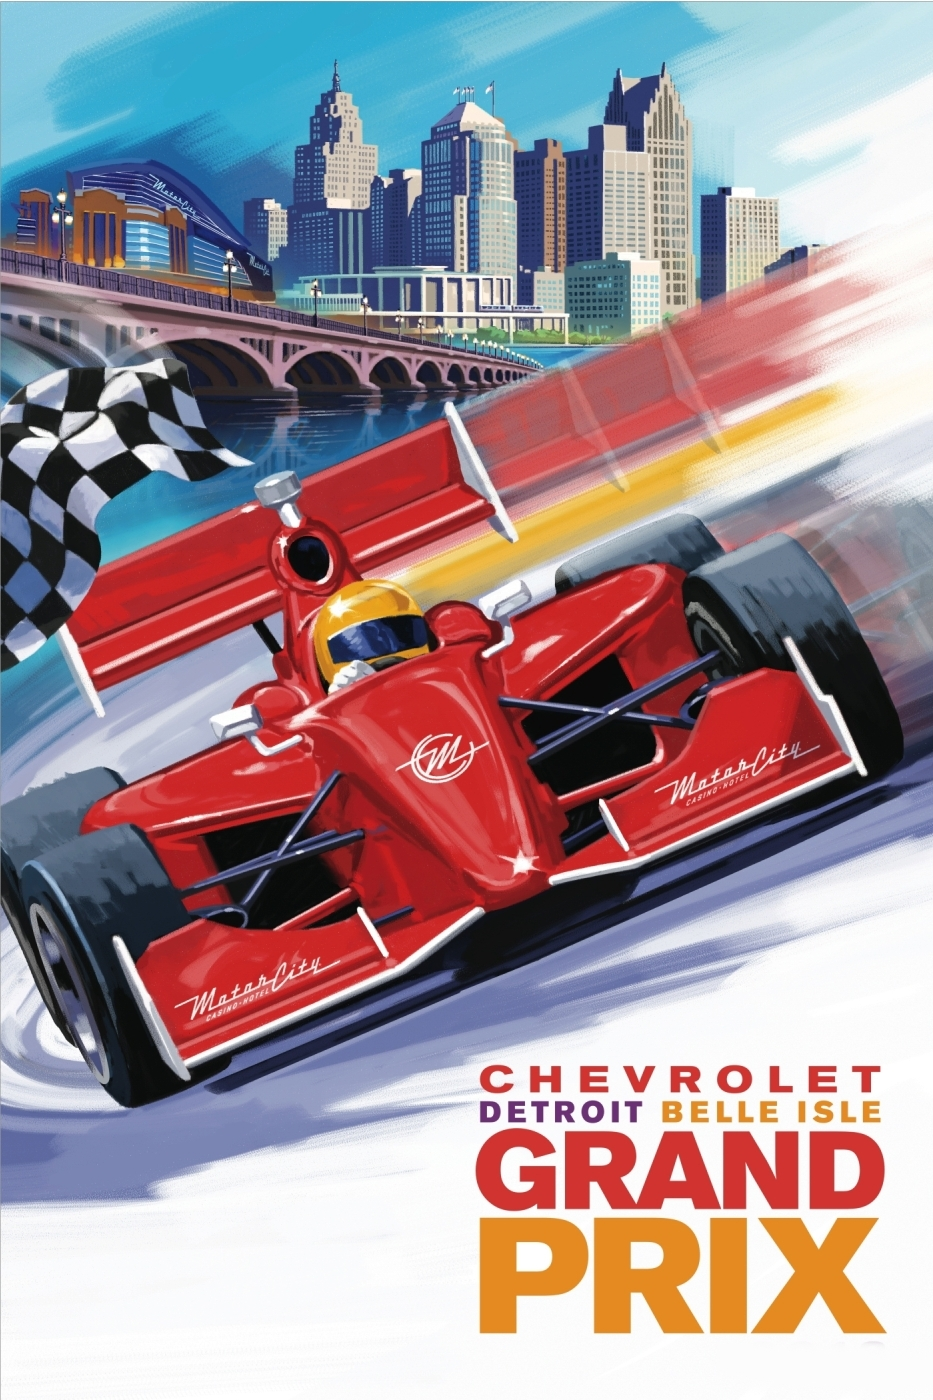 grand prix 2013 poster